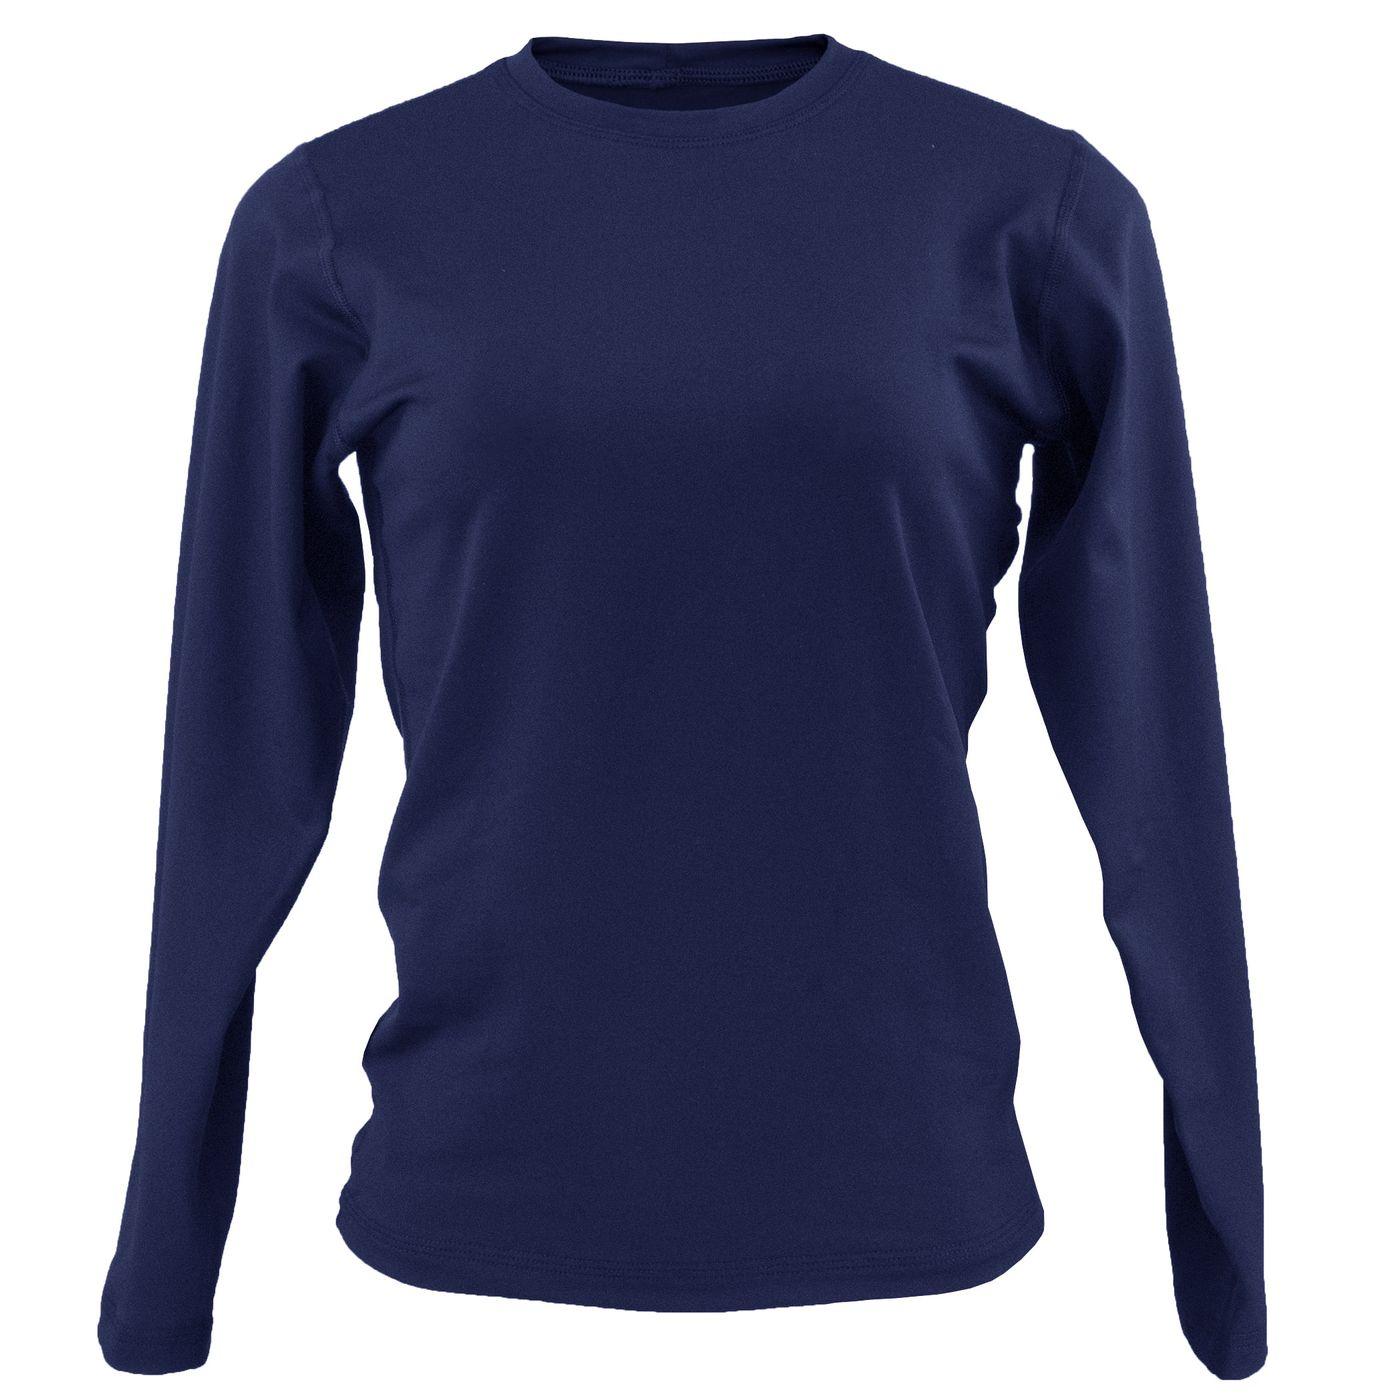 d4f56ee49 Blusa feminina azul marinho segunda pele térmica - fieroshop